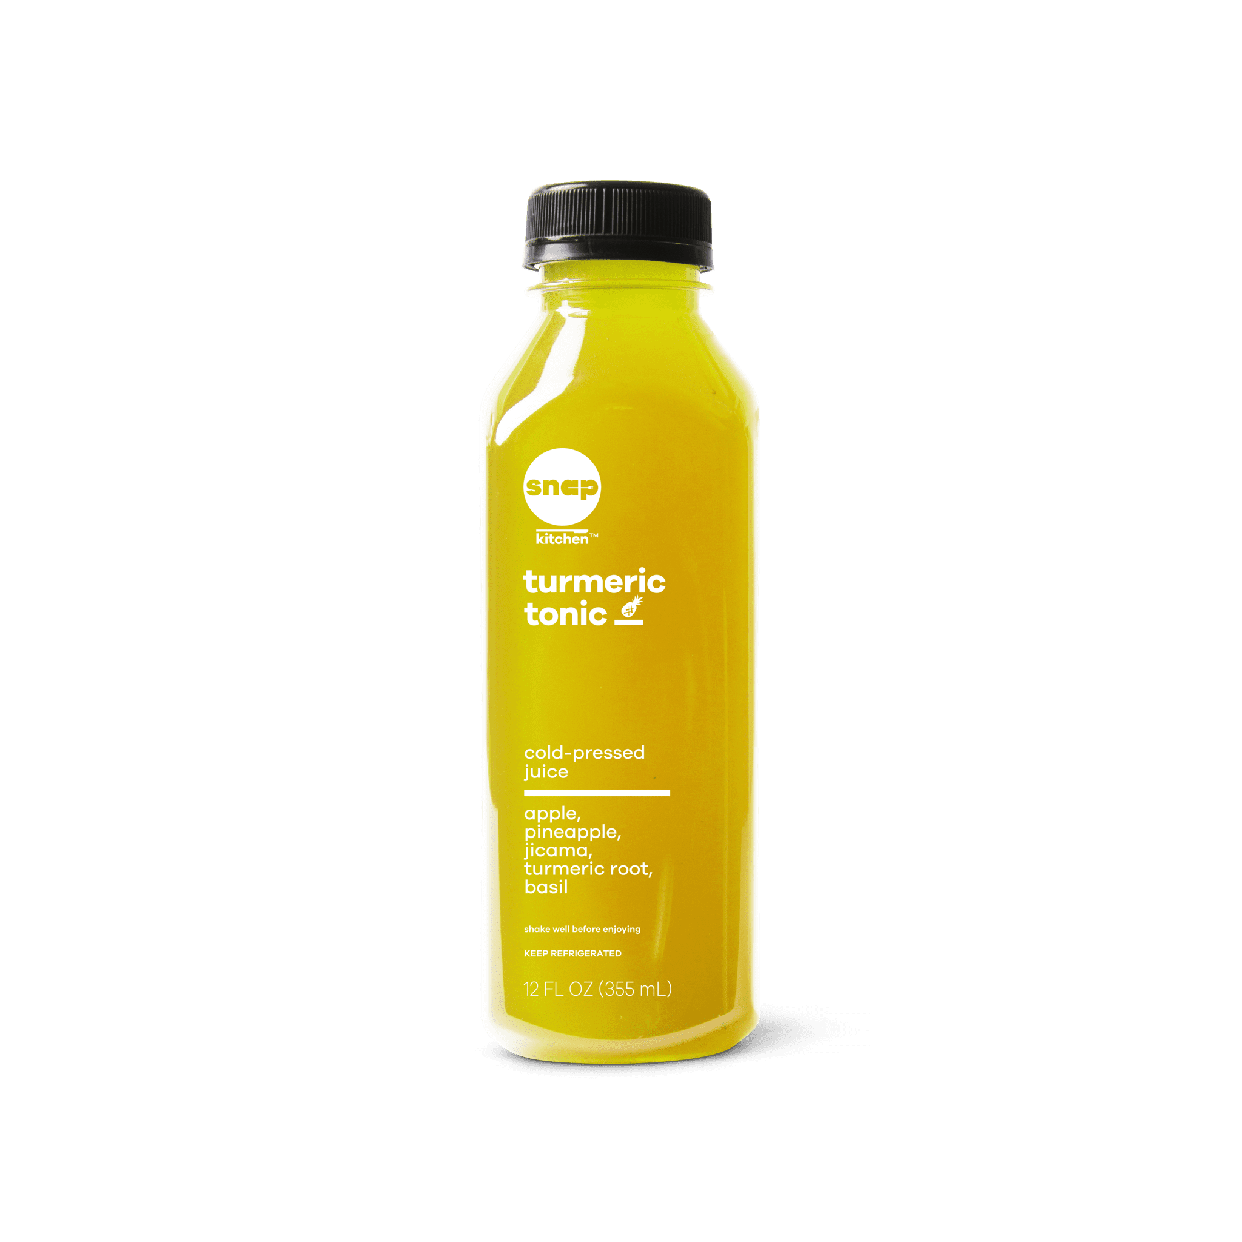 Snap Kitchen Juice Menu